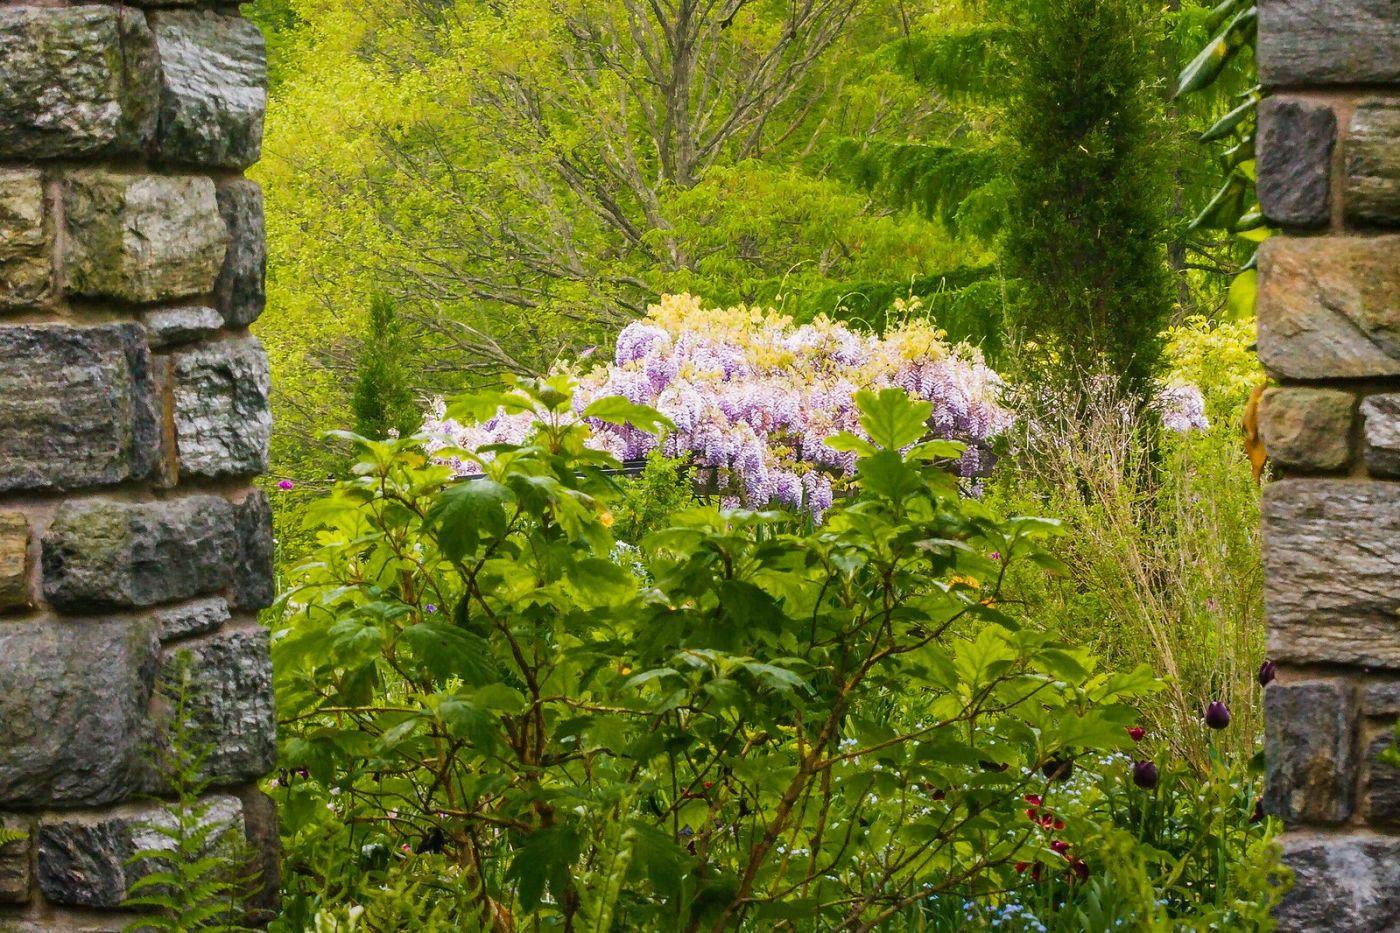 Chanticleer花园,有梦想的季节_图1-19